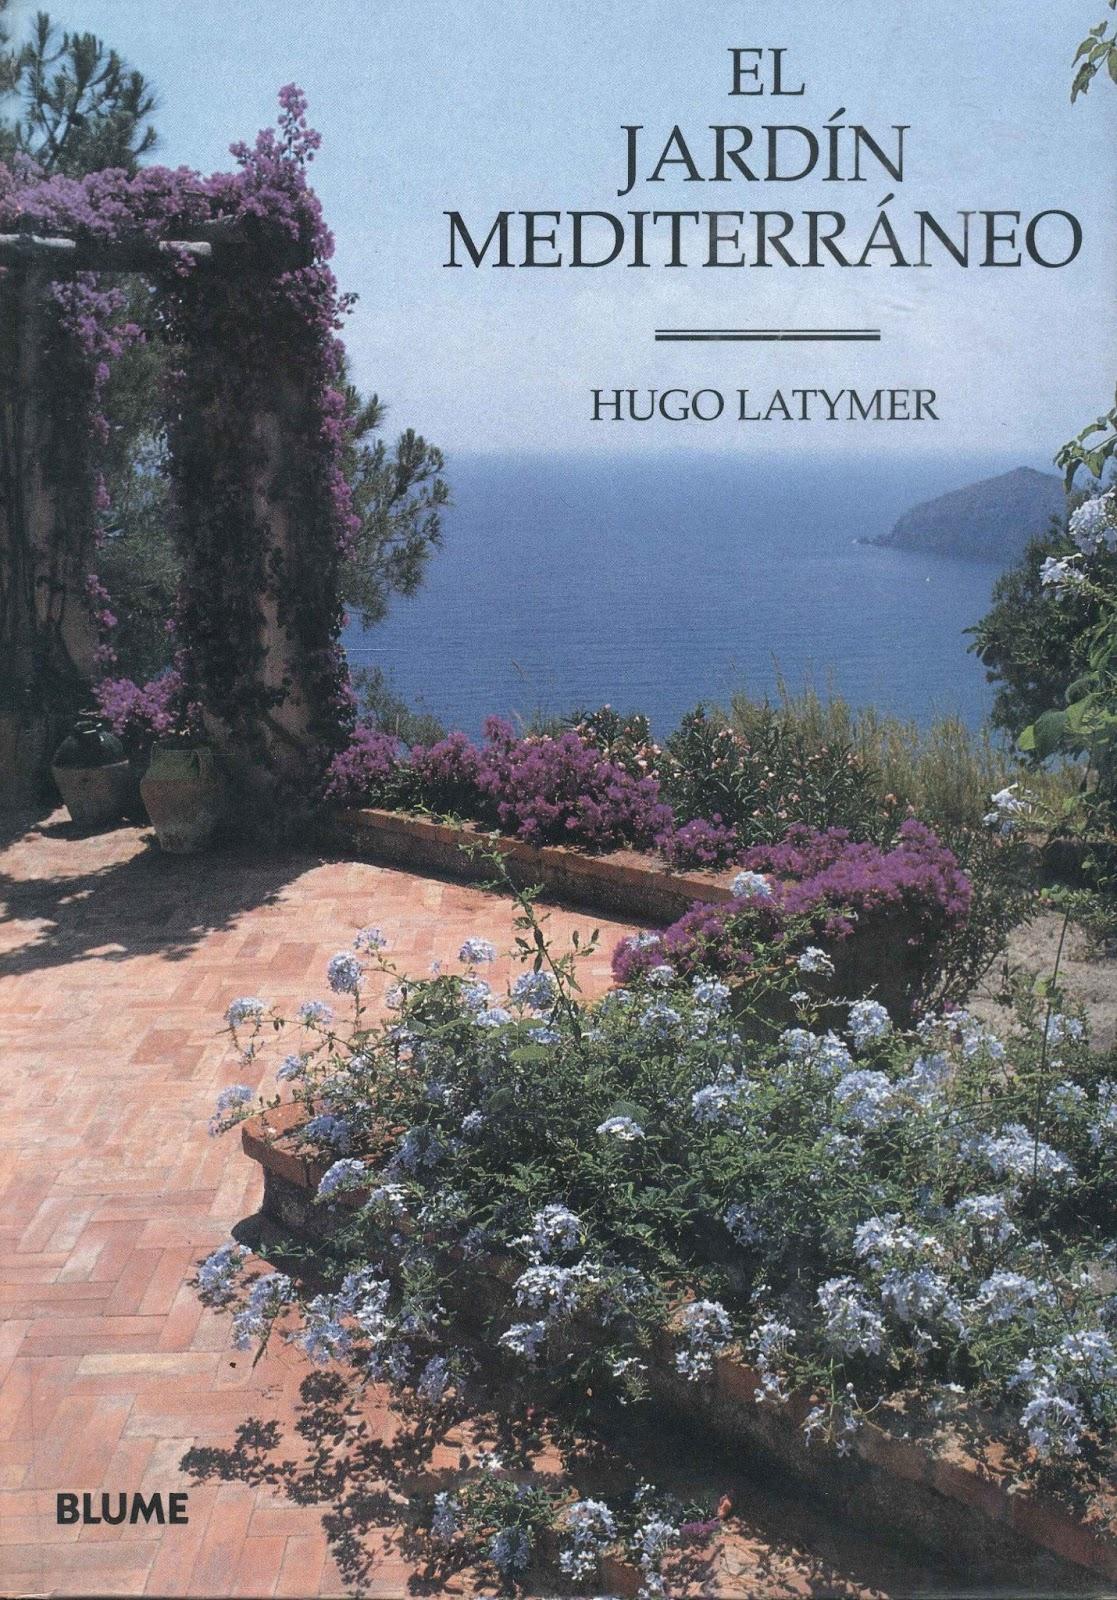 F p agraria el jard n mediterr neo - El jardin mediterraneo ...